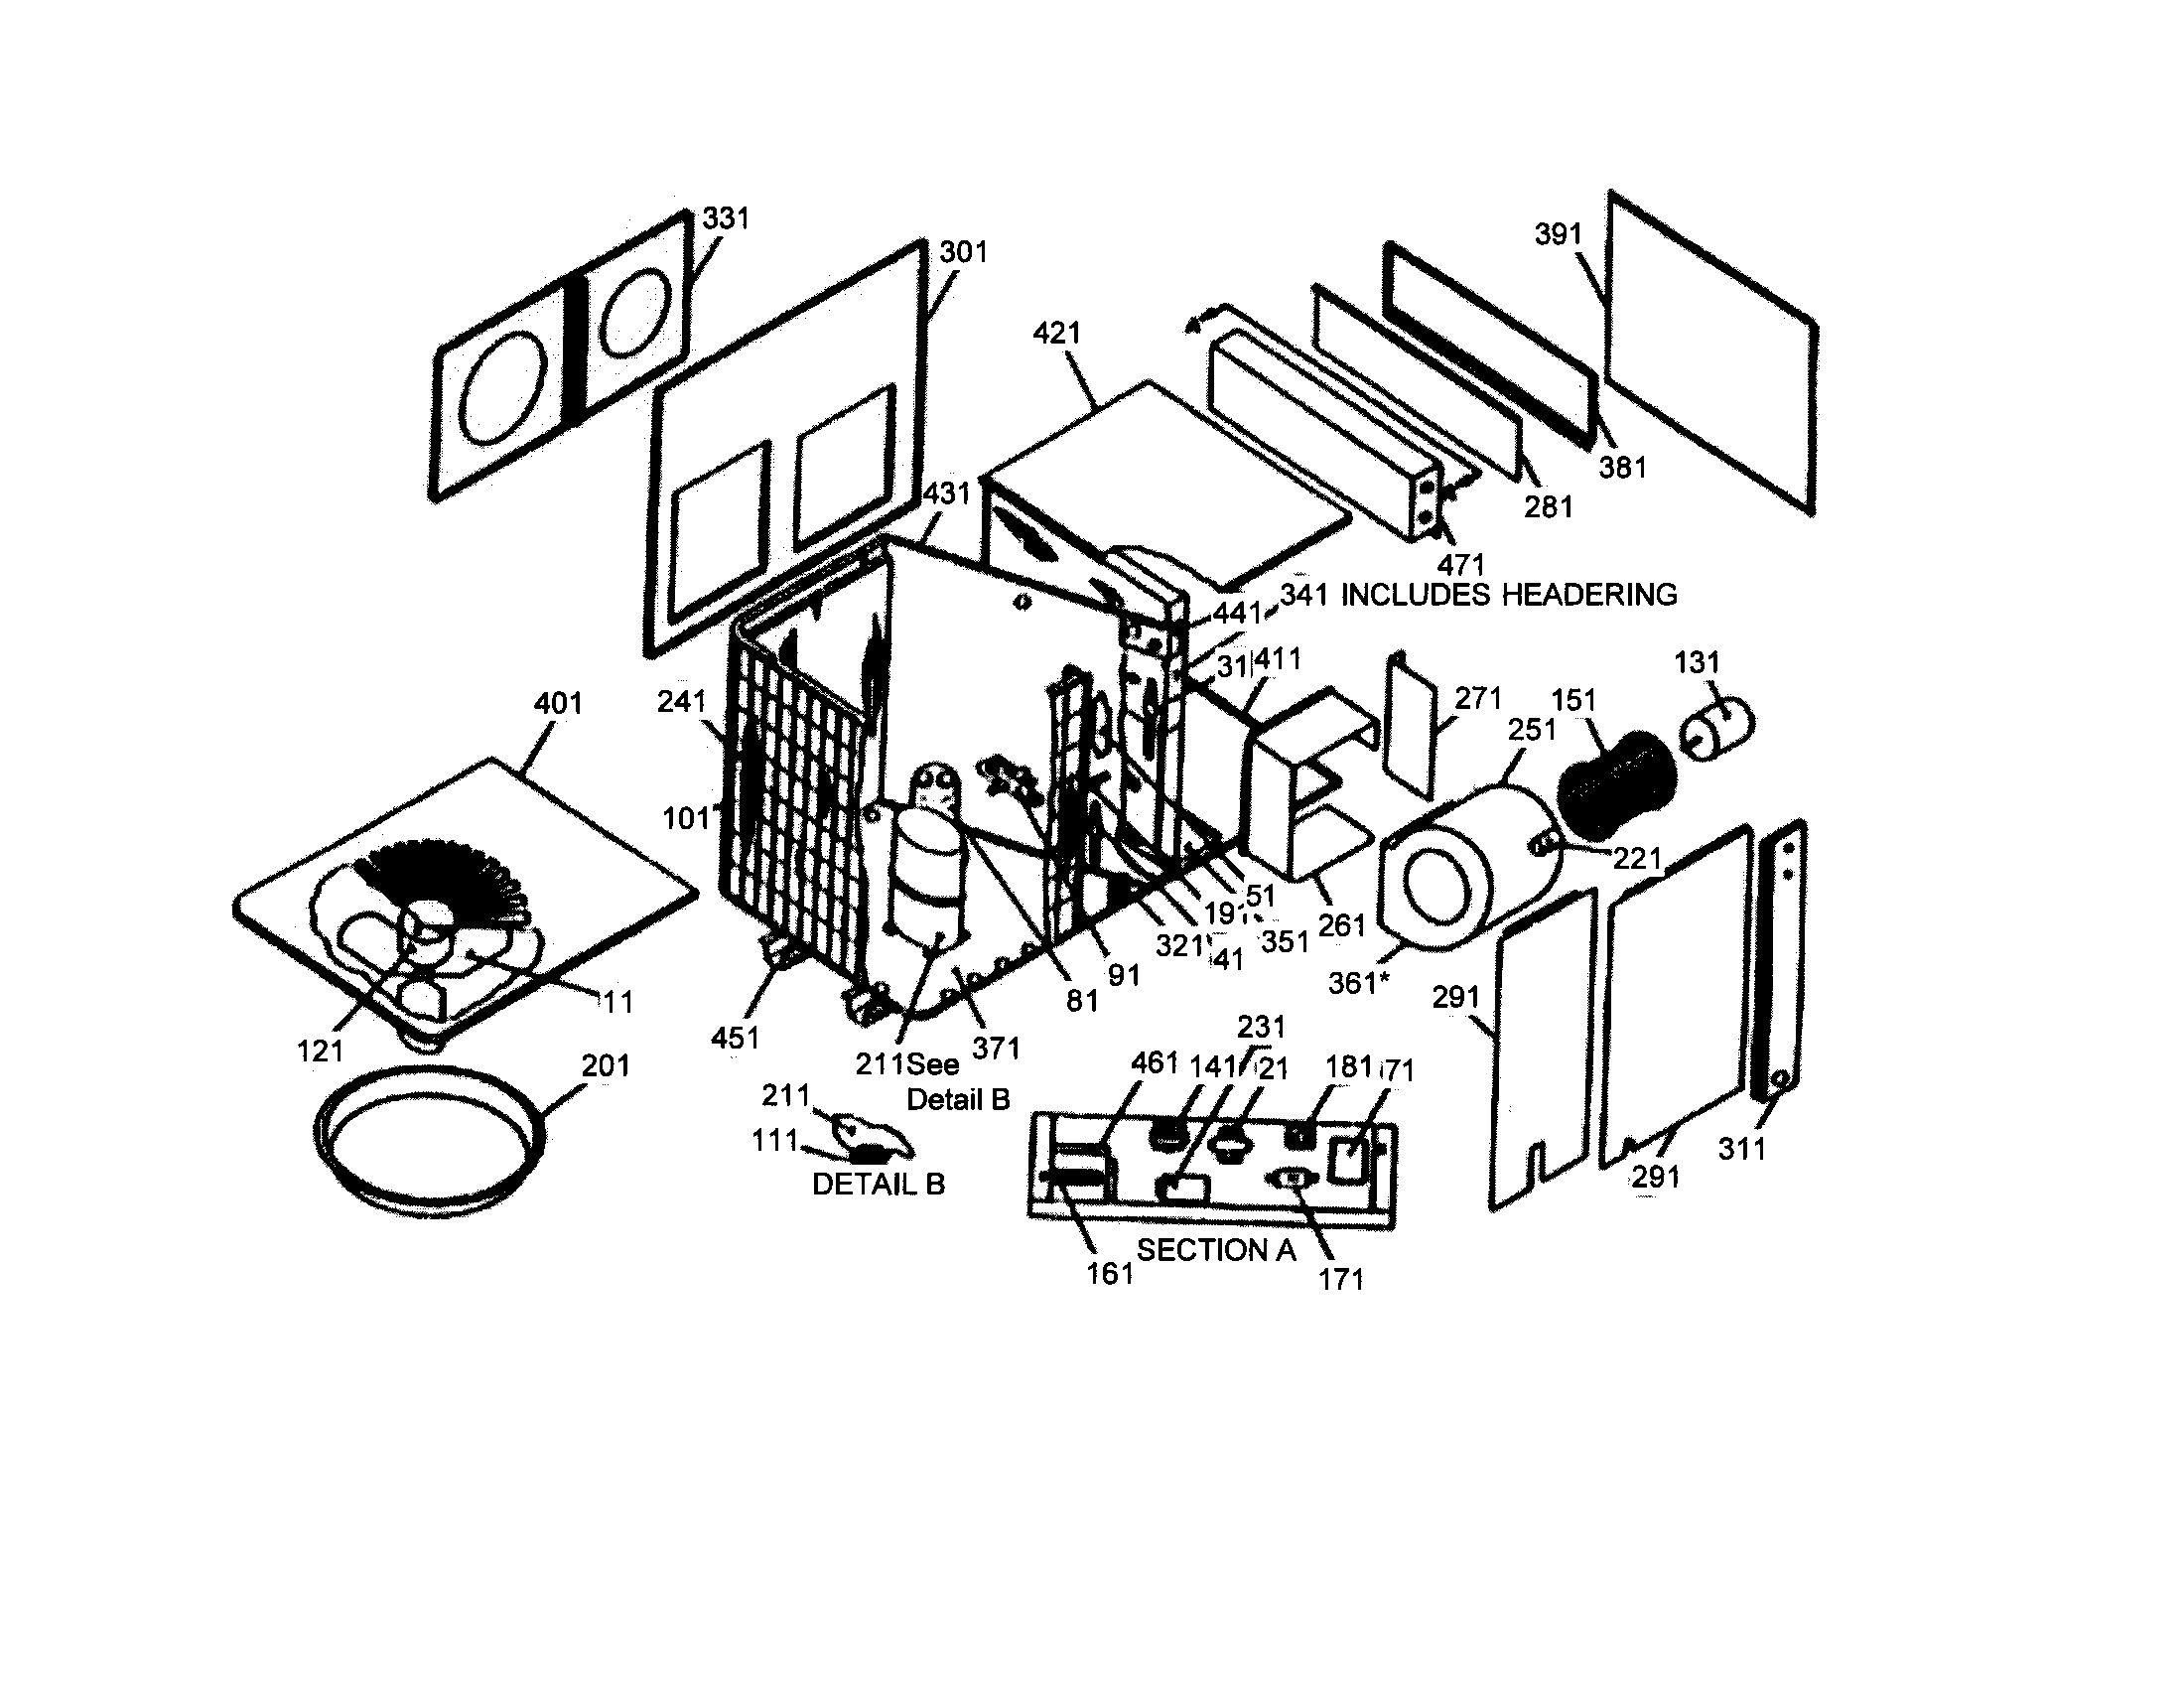 Goodman Phk024 1f Wiring Diagrams In